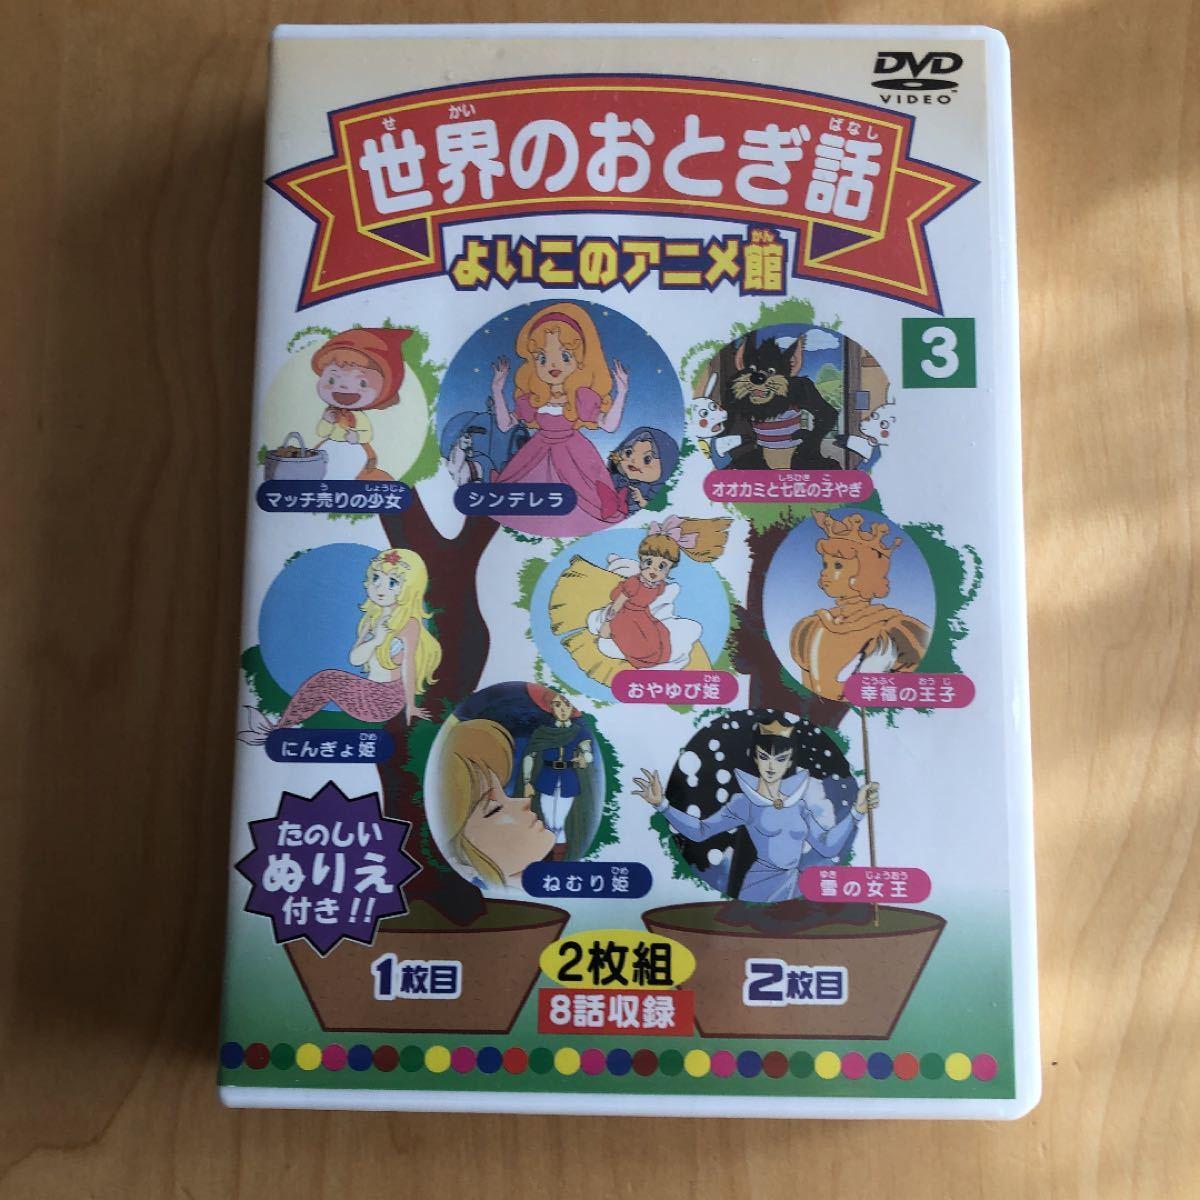 DVD世界のおとぎ話 収録アニメ8話(90分)